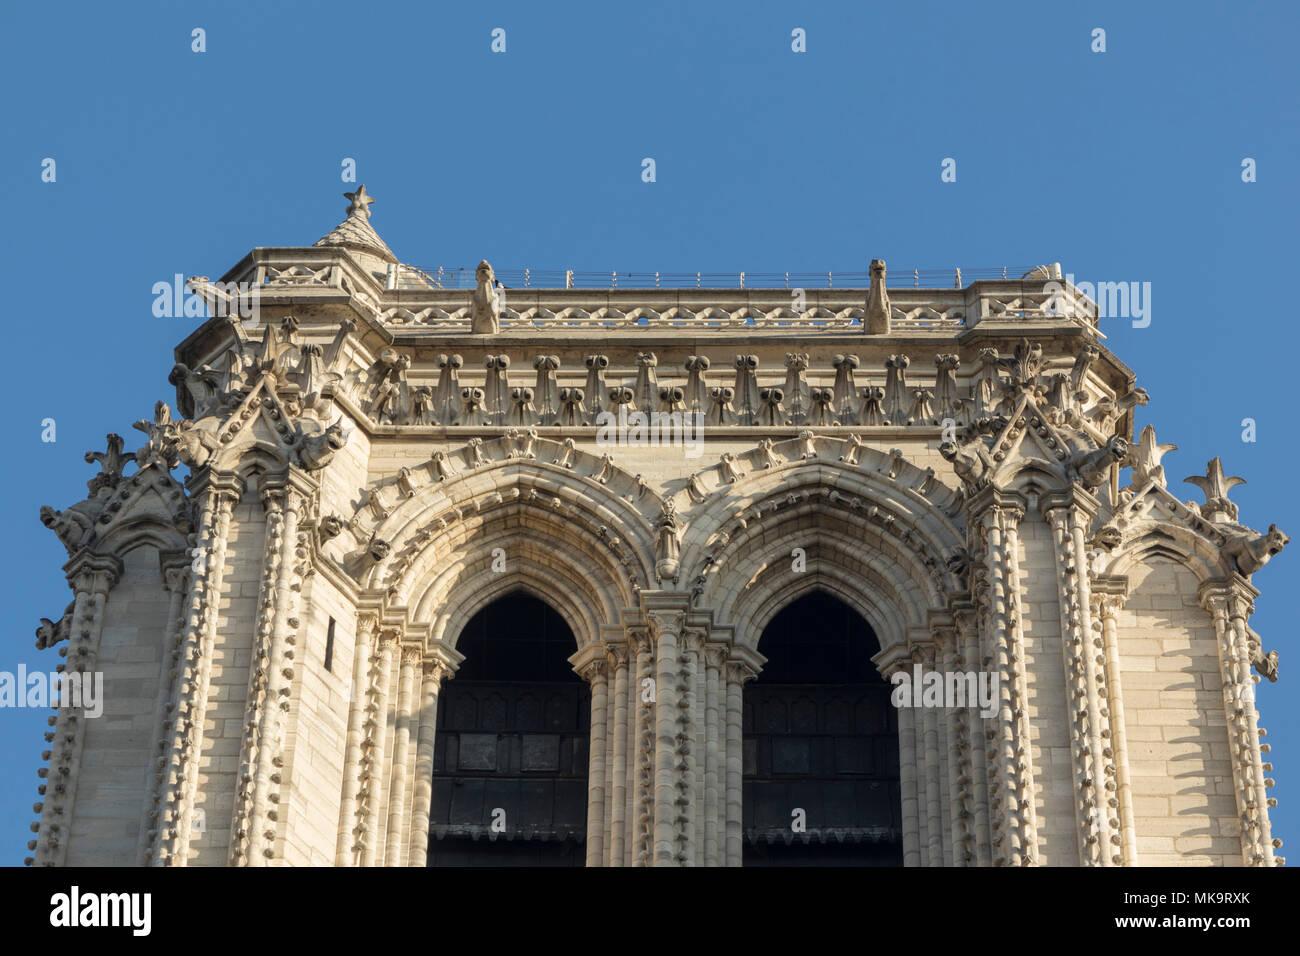 cathedral of Notre-Dame de Paris , France - Stock Image